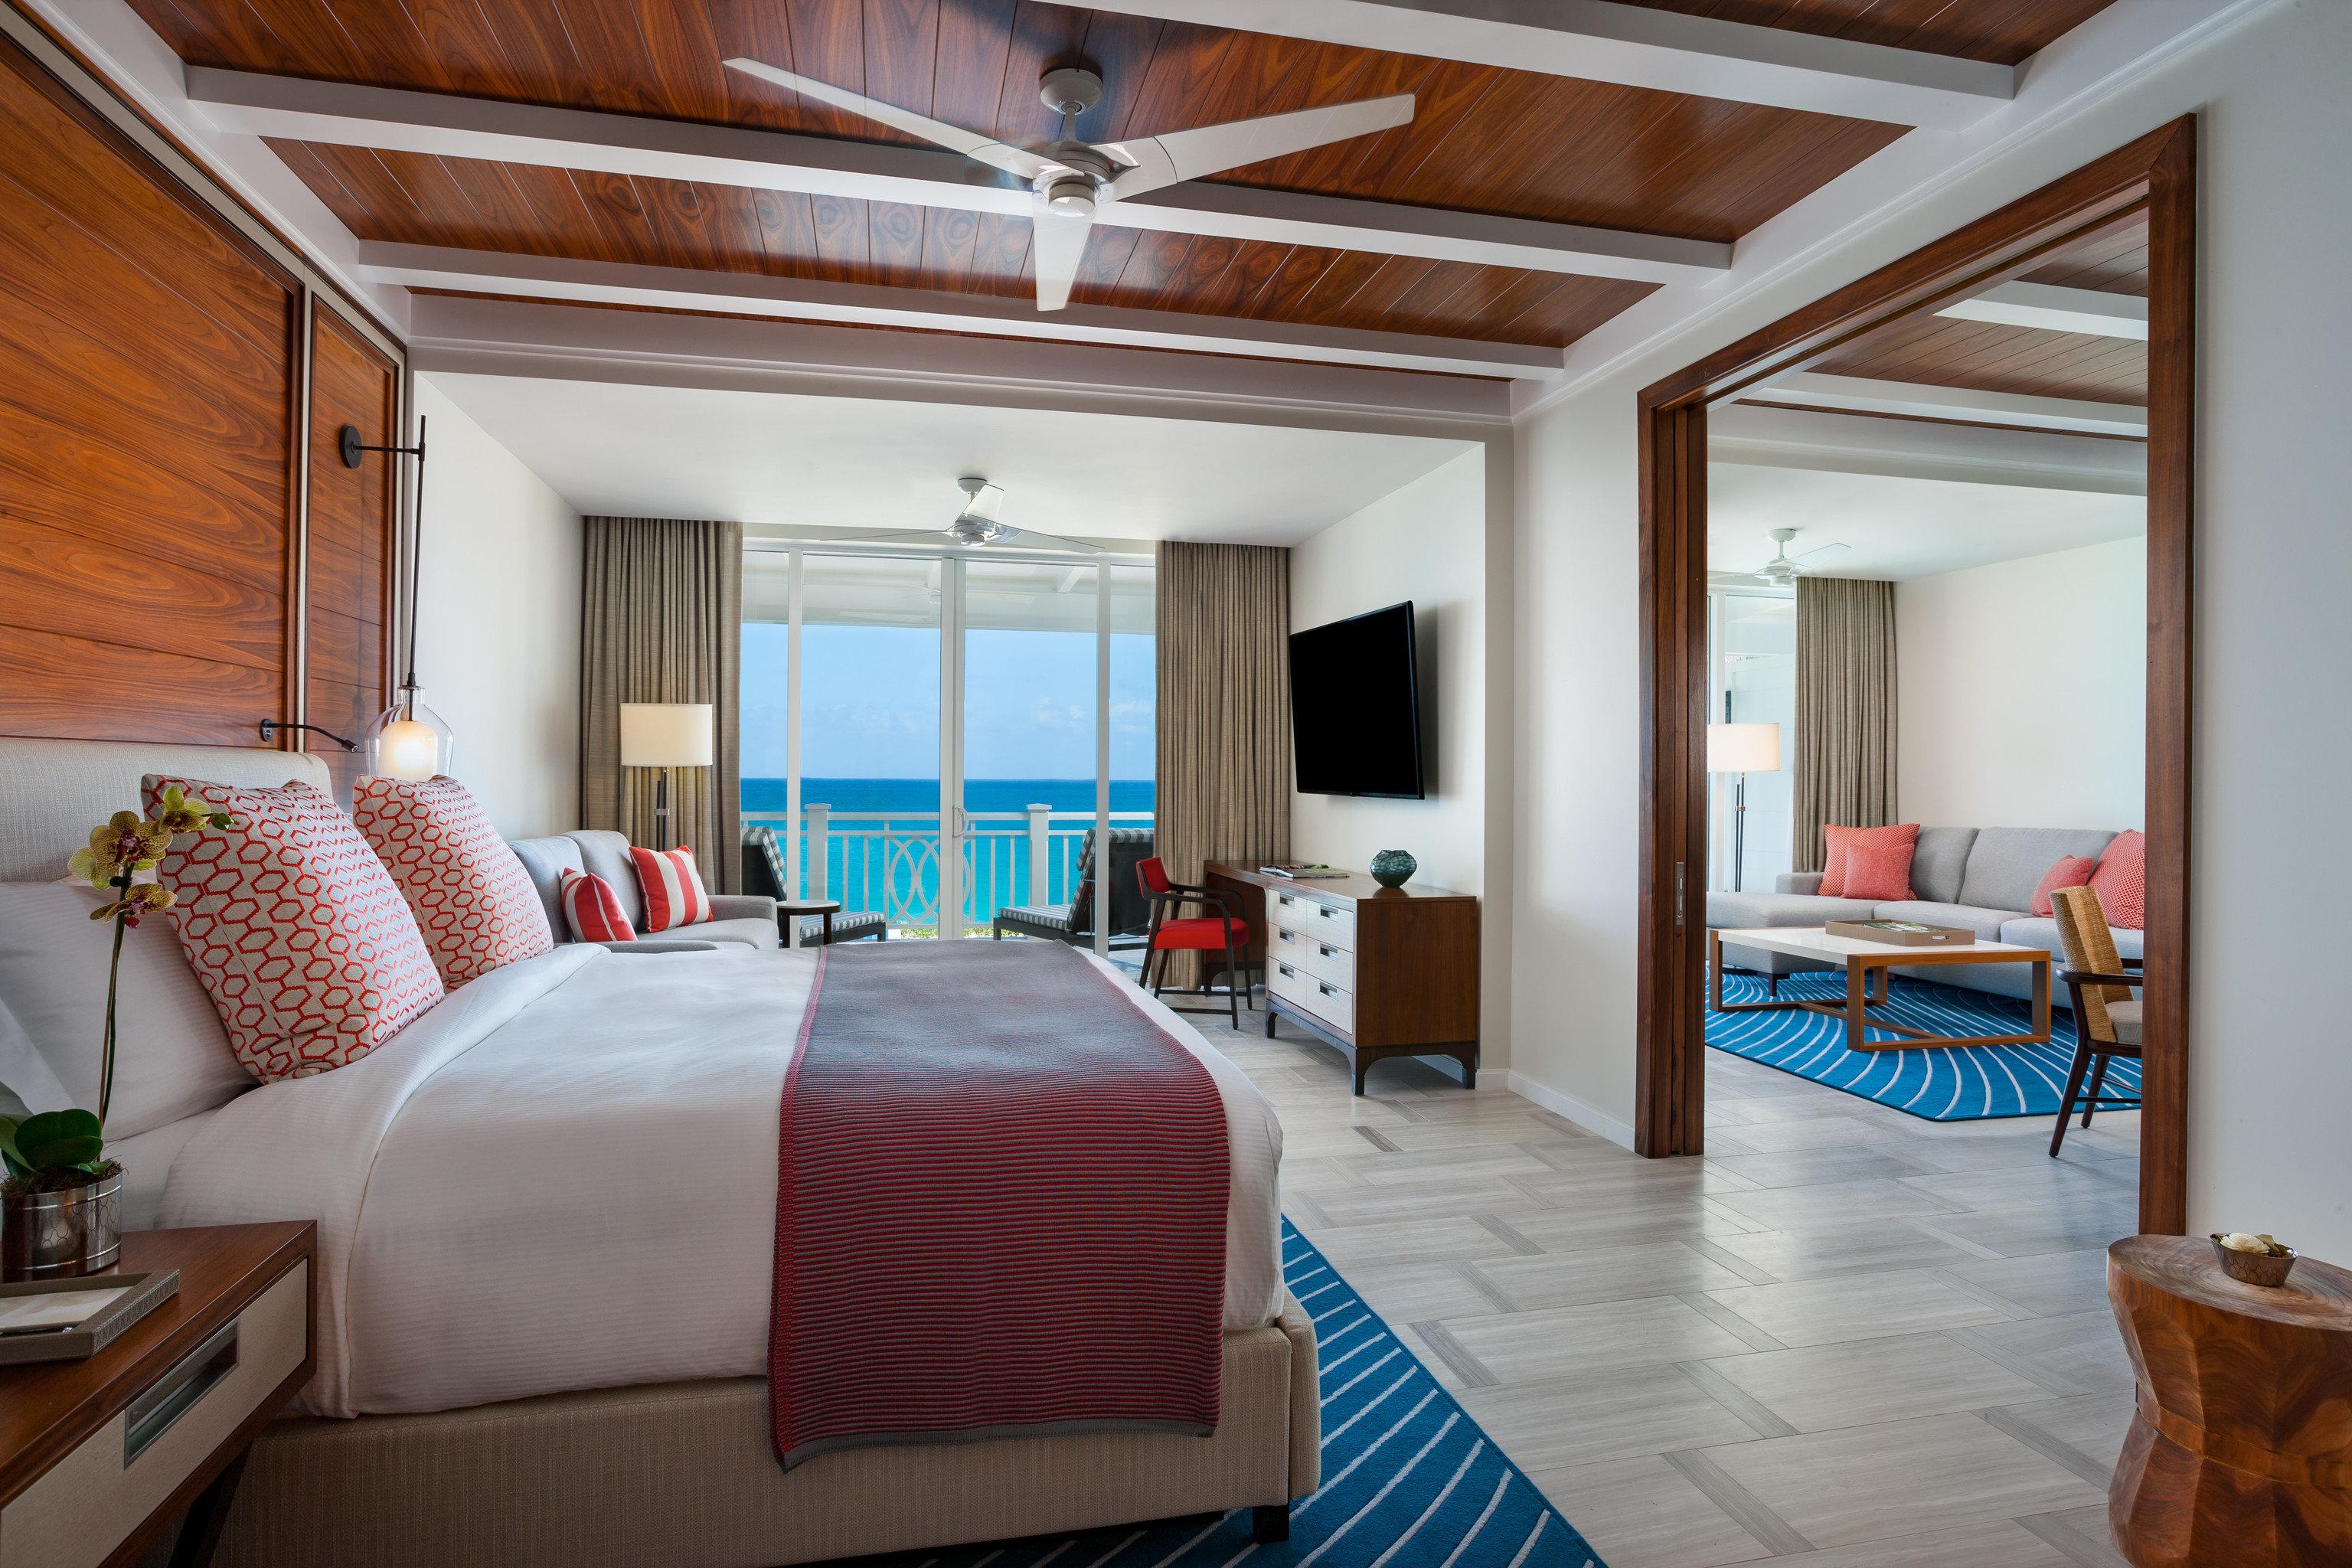 Hotels Romance property house home cottage living room Villa Bedroom Suite farmhouse Resort